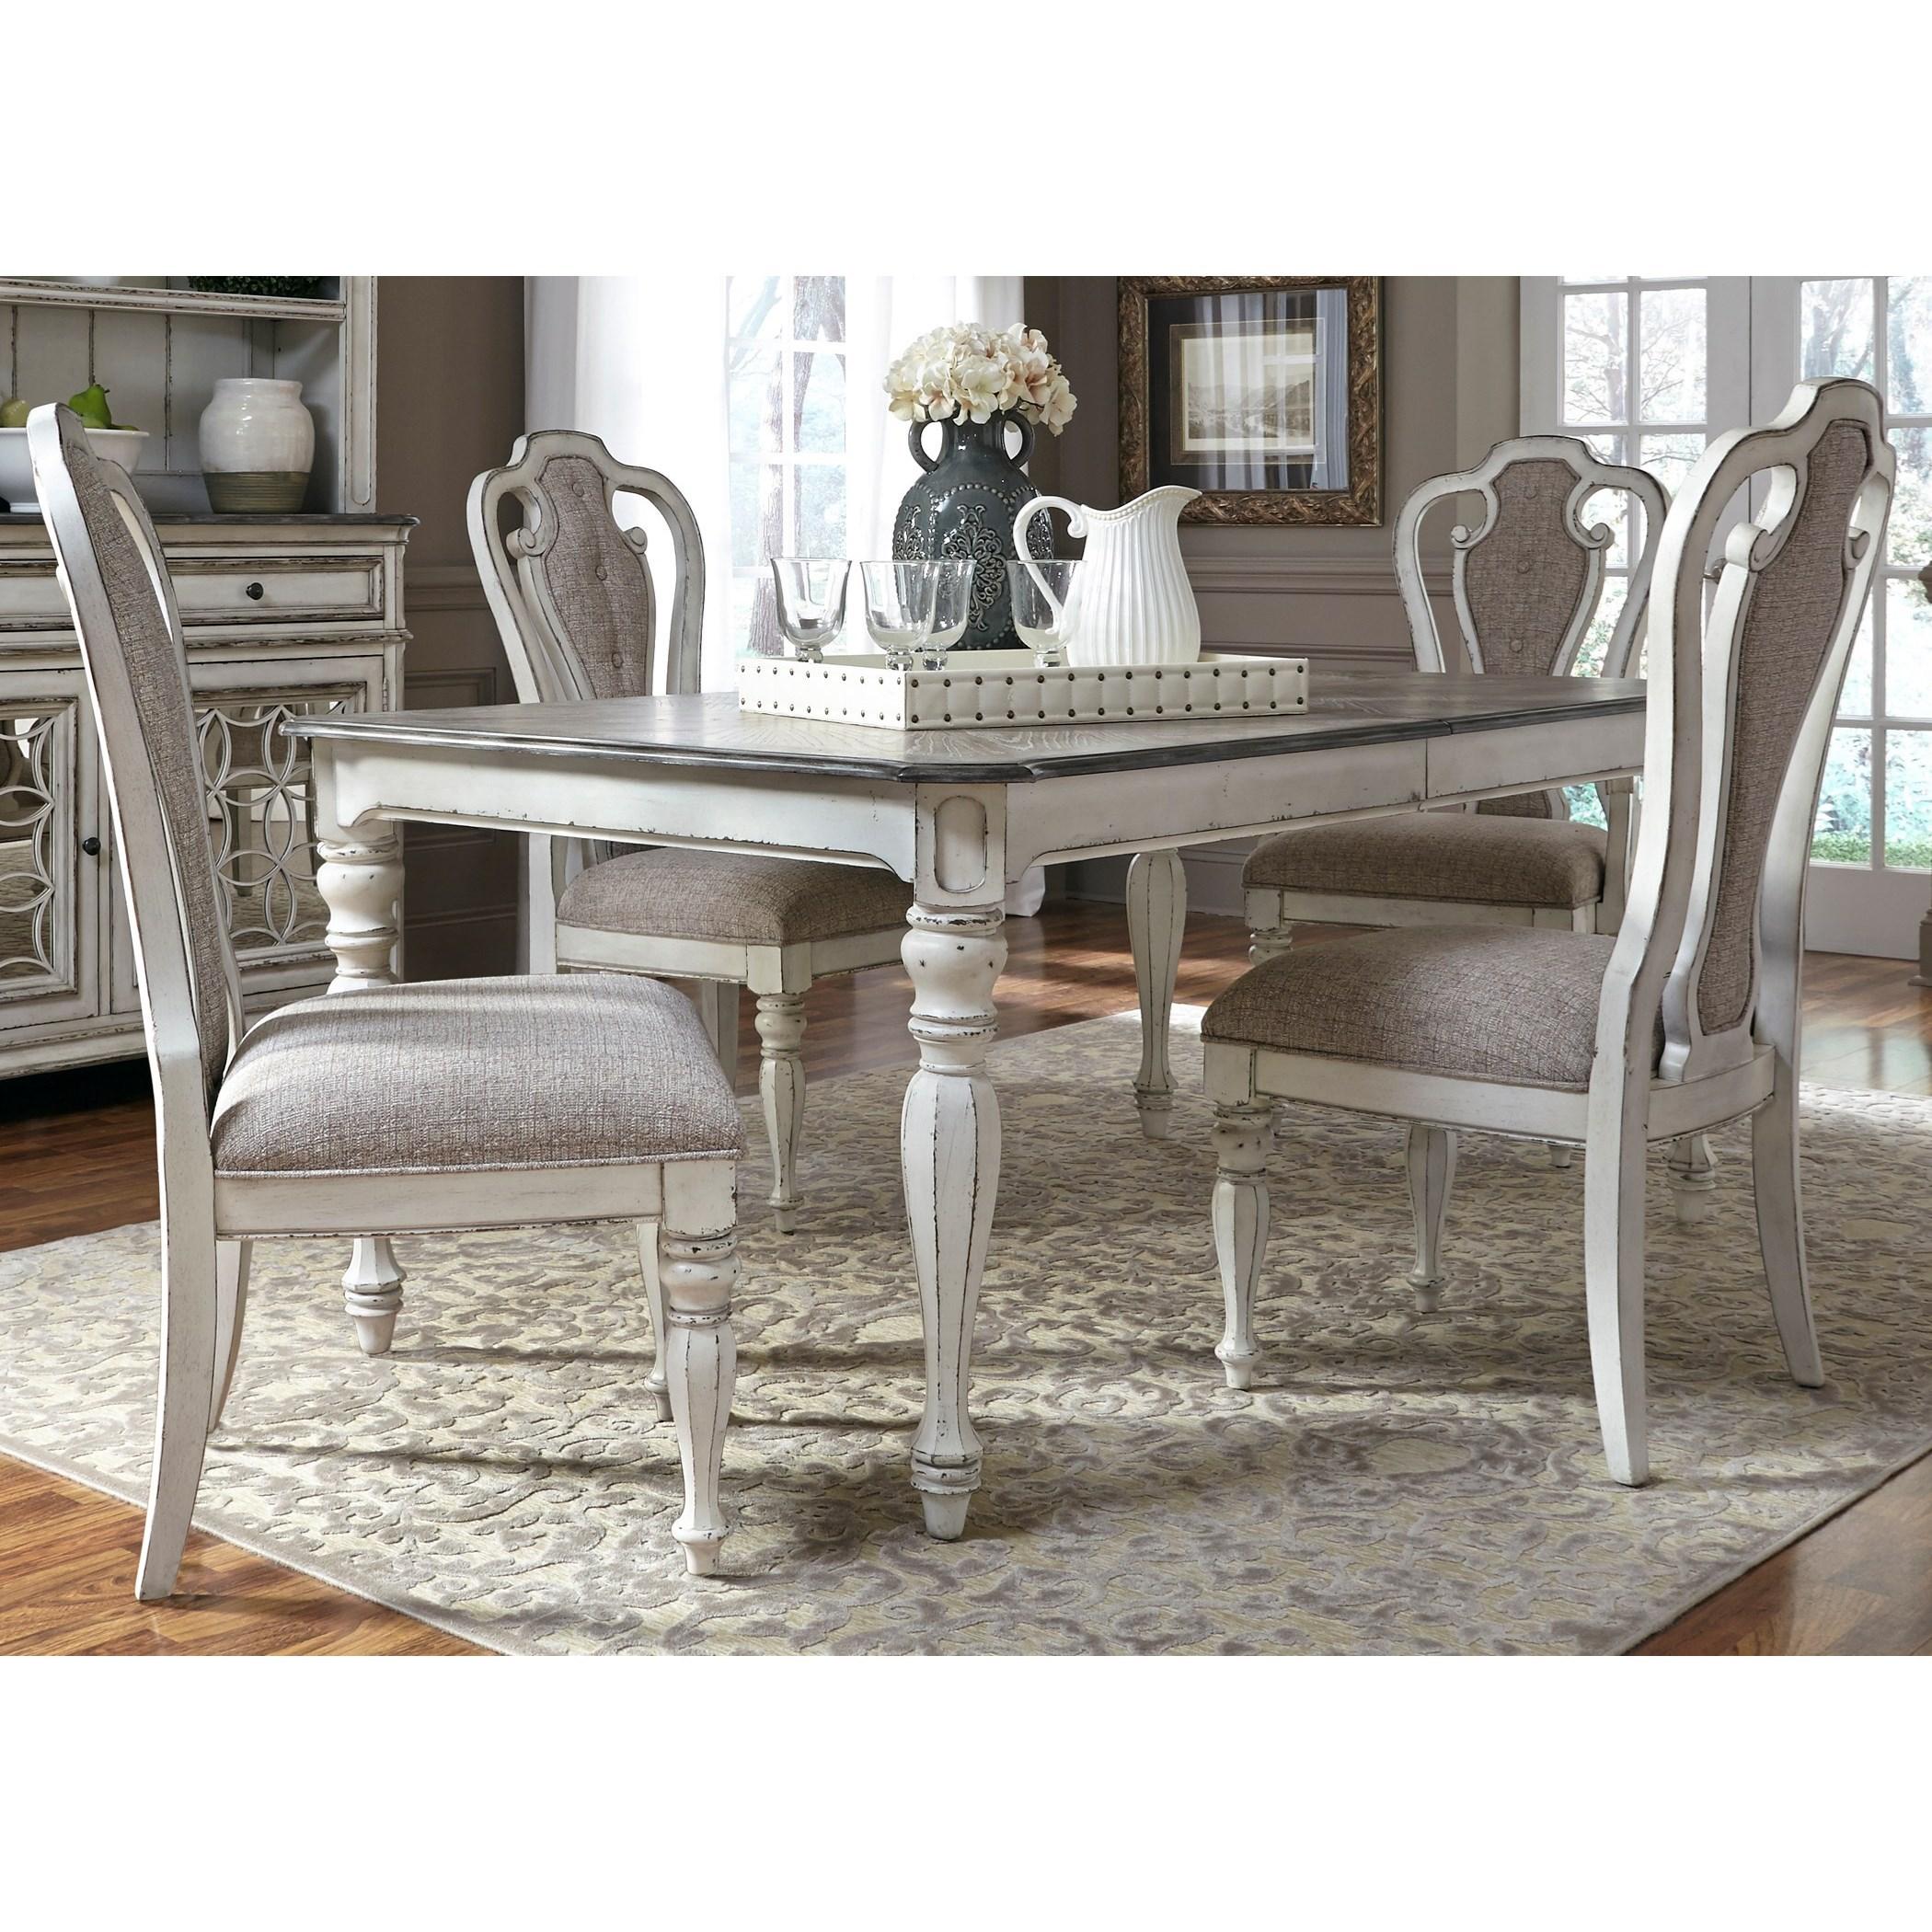 Dining Room Sets Johnny Janosik Liberty Furniture Magnolia Manor Splat Back Side